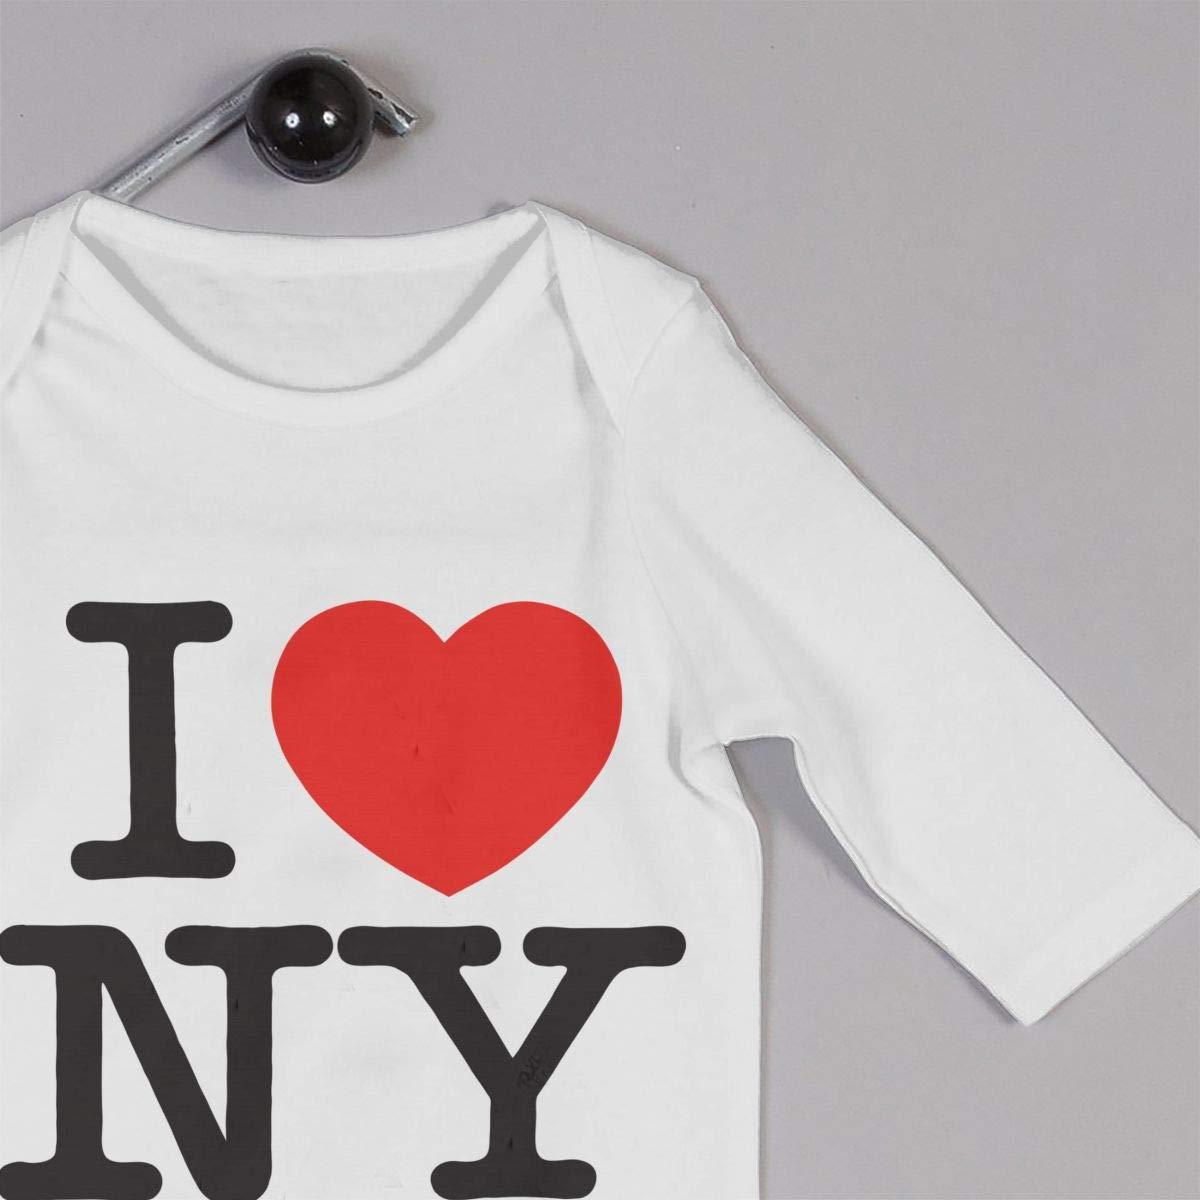 I Love New York Unisex Baby Bodysuit Infant Cotton Outfits Long Sleeve Jumpsuit